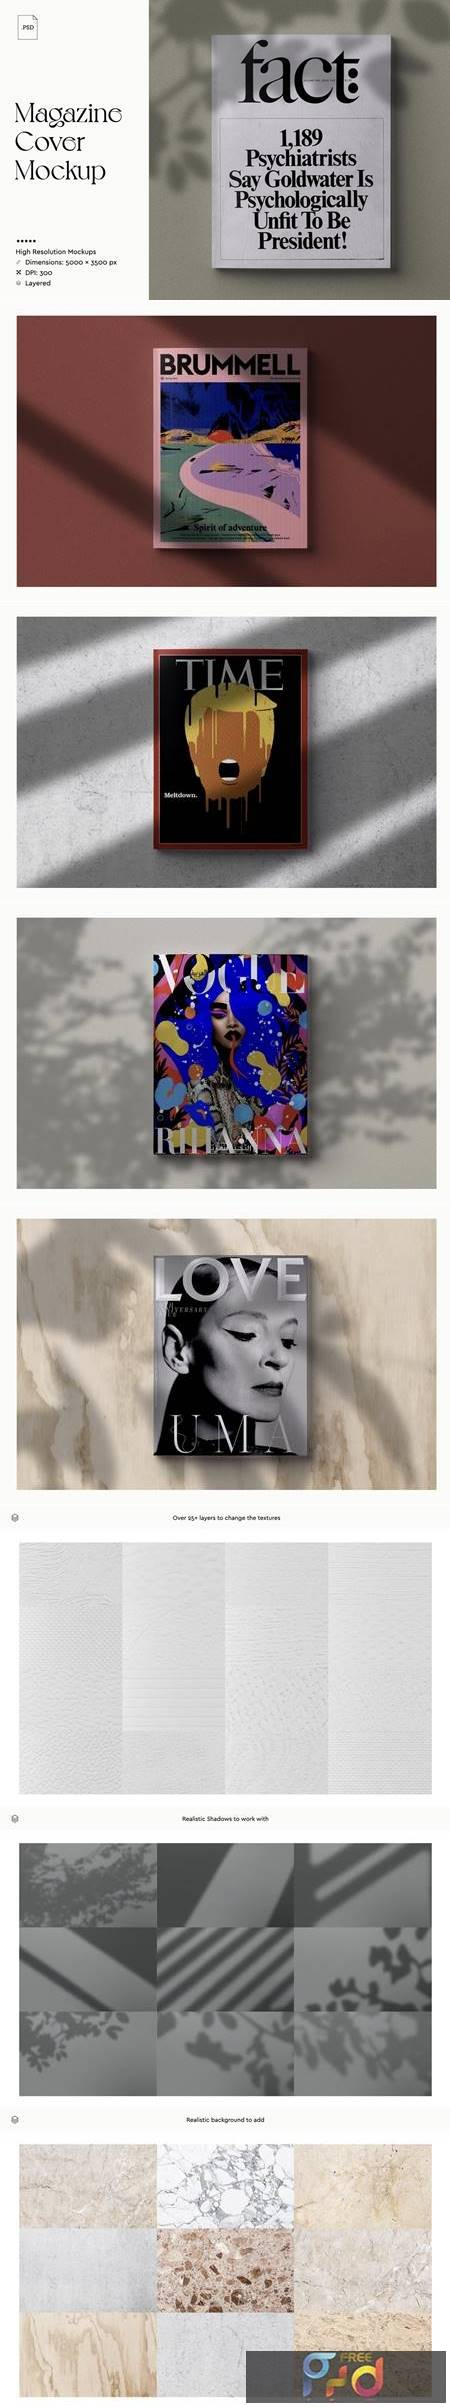 Magazine Cover Mockup 3748554 1